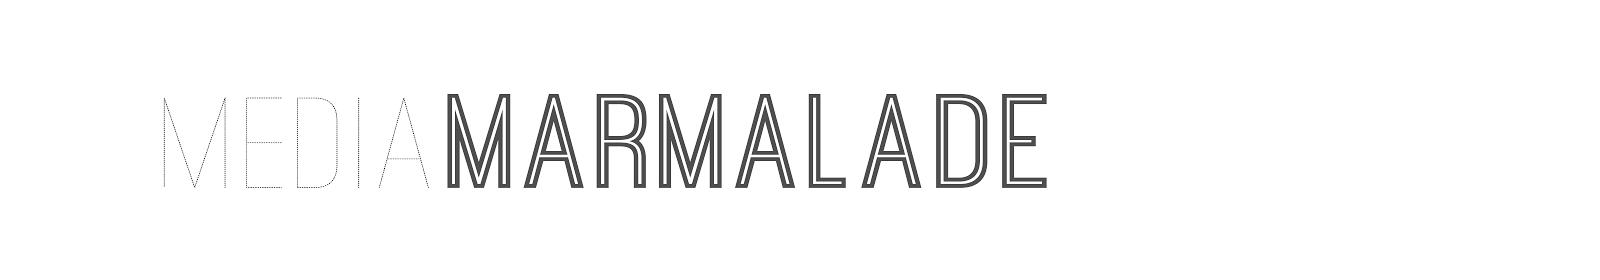 Marmalade - British Style Blog